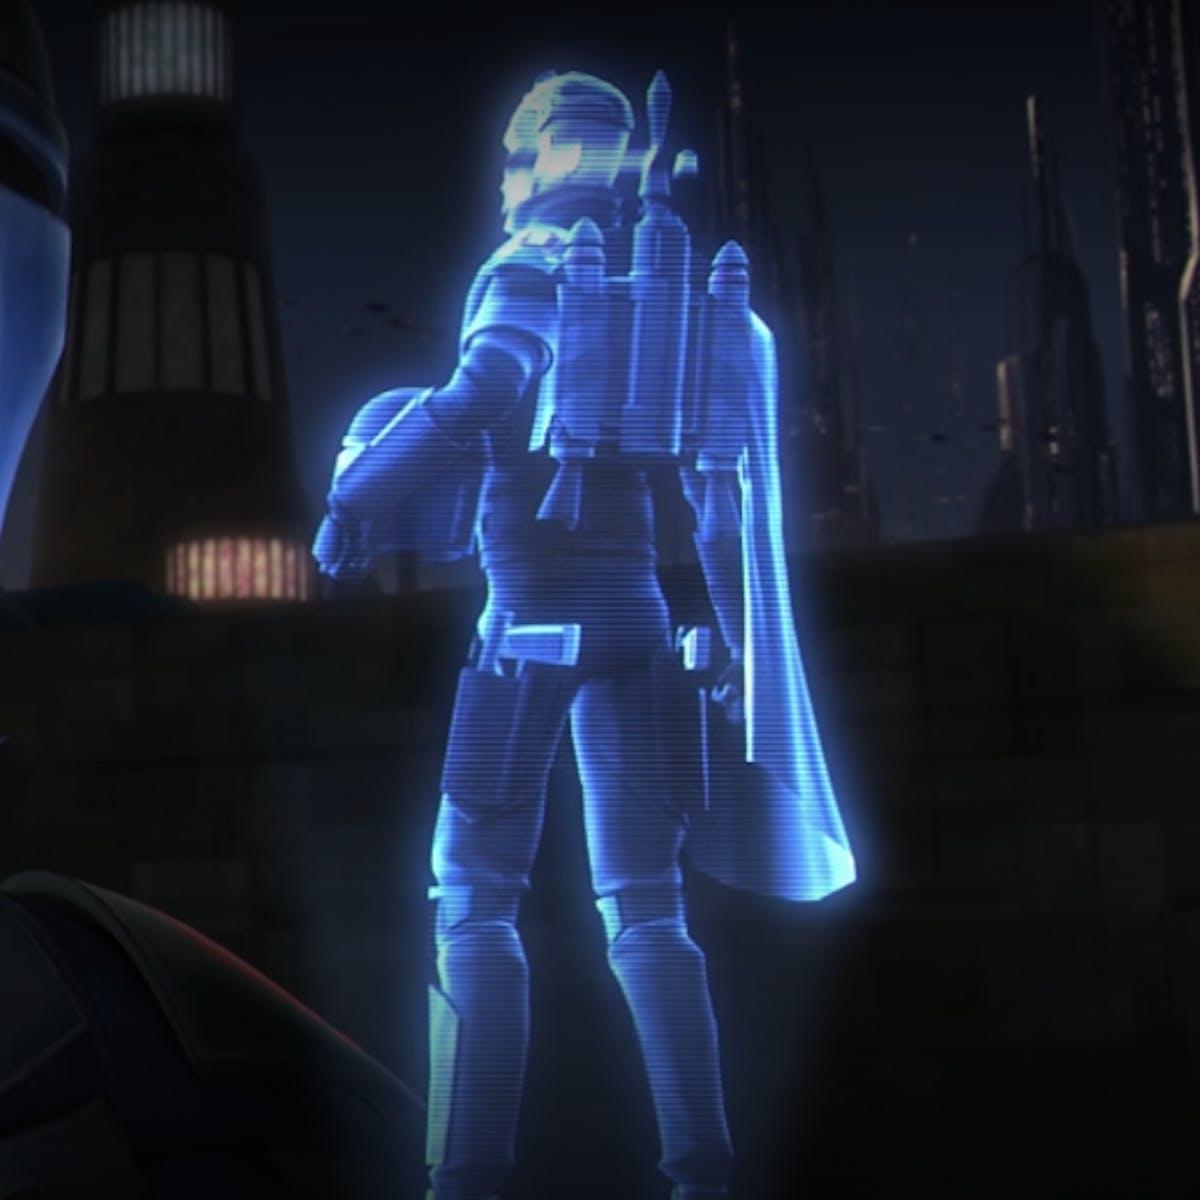 13 essential Mandalorian episodes of 'The Clone Wars' & 'Rebels' on Disney+